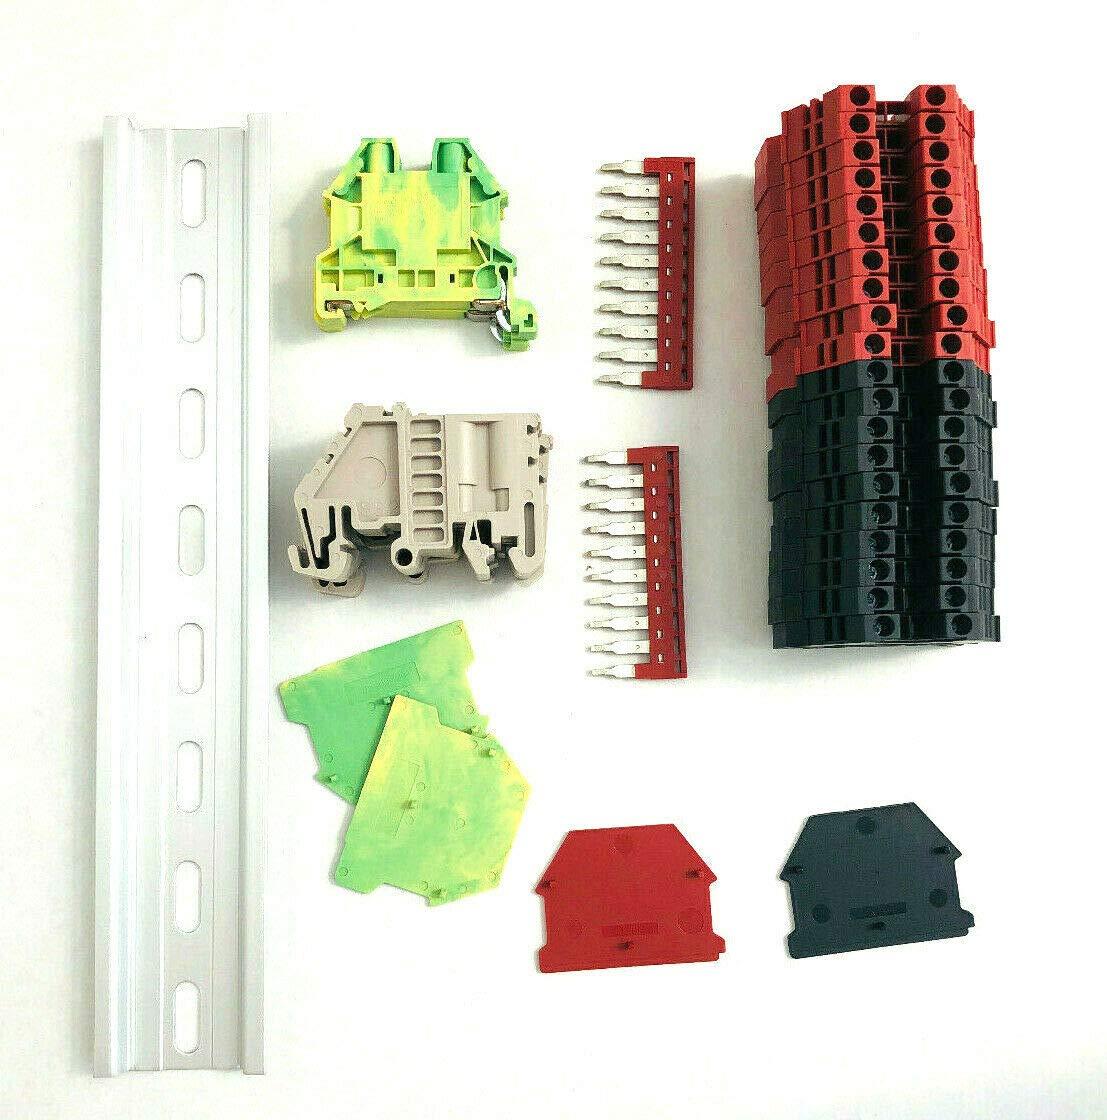 DIN Rail Terminal Block Kit Animer and price revision #2 Red Manufacturer OFFicial shop Black G 10 20 DK4N AWG Dinkle